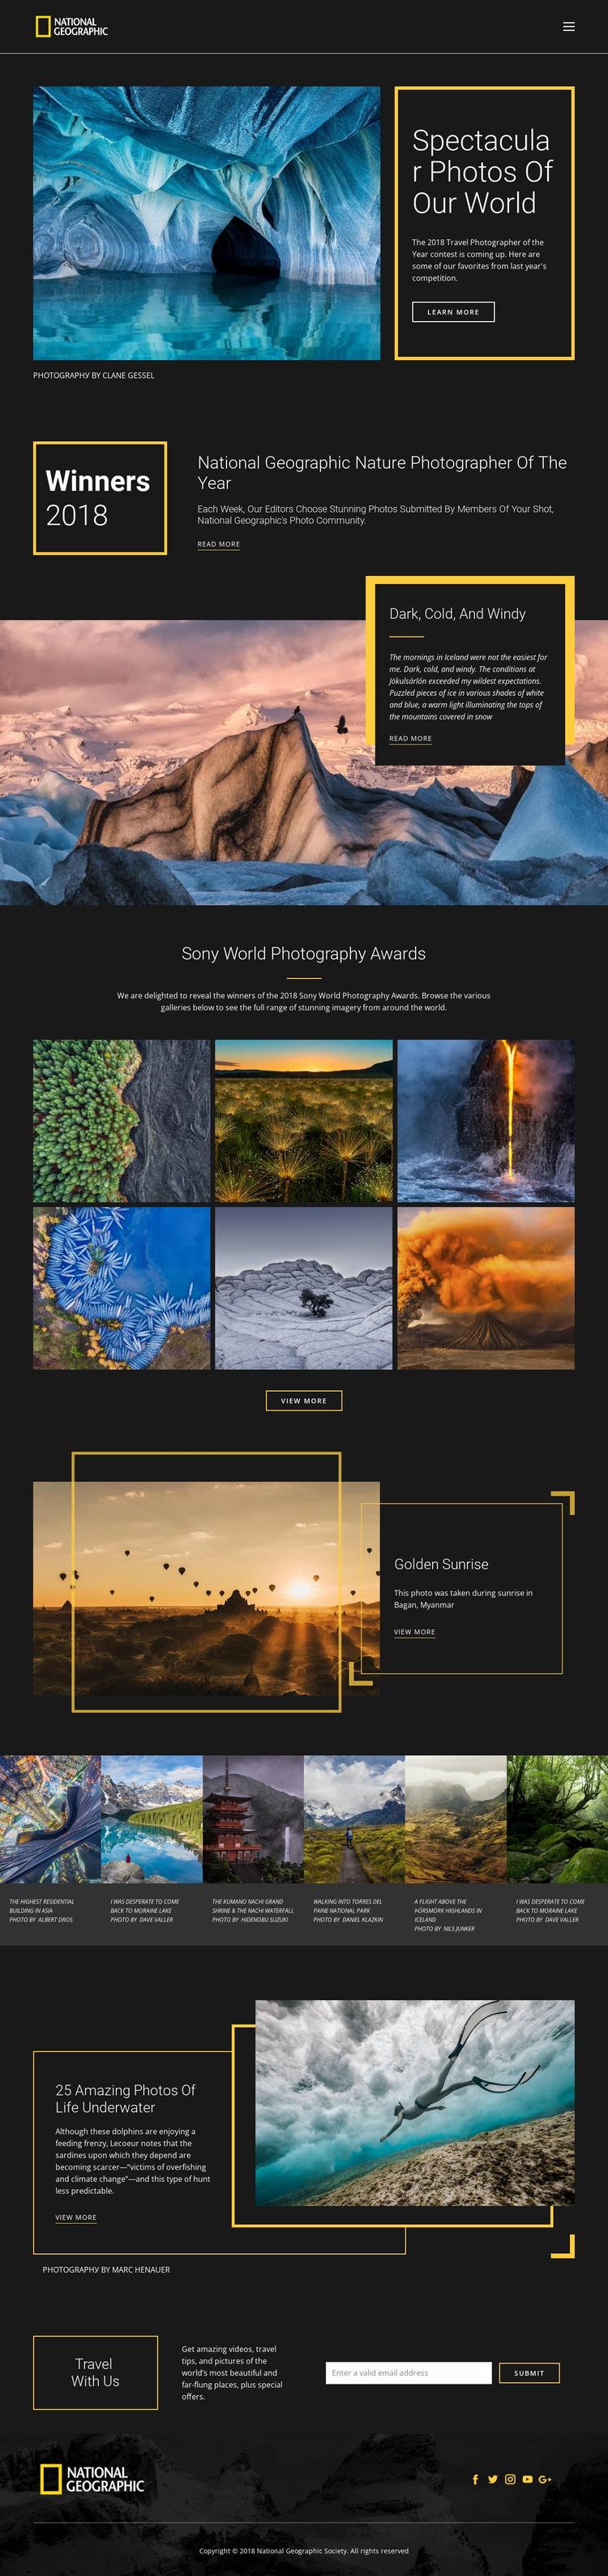 Pictures of nature Website Builder